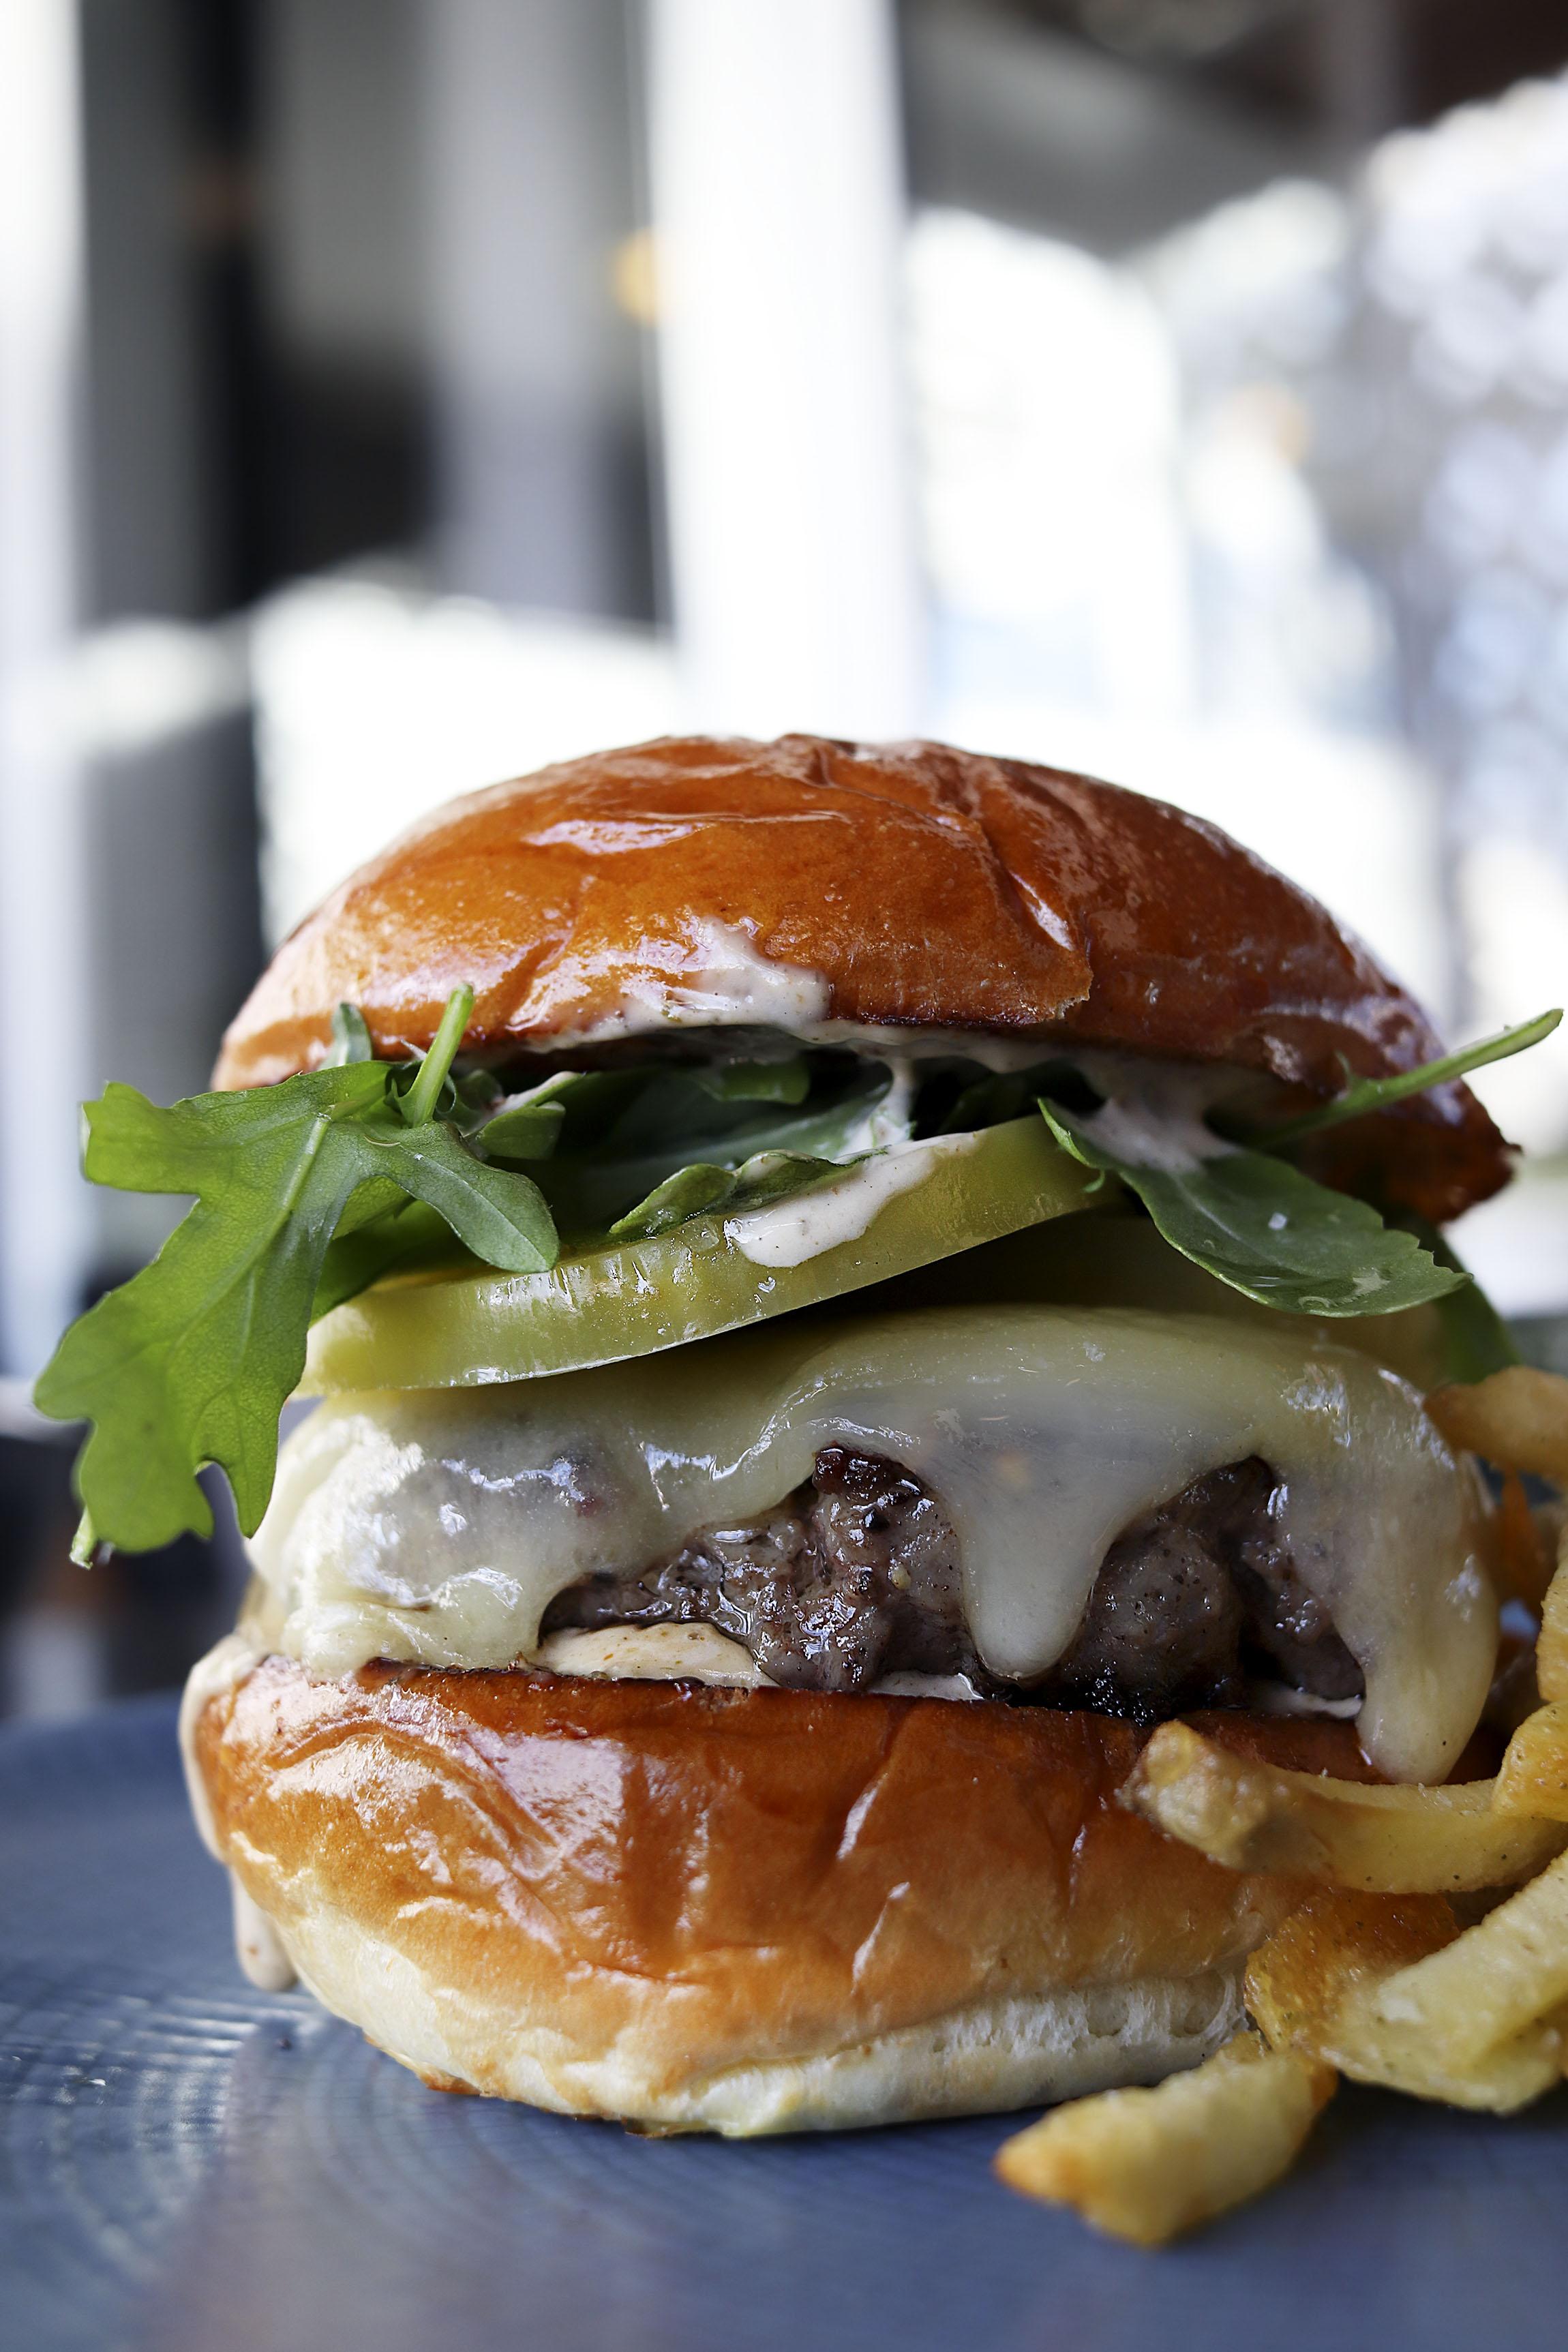 Mister O's Burger